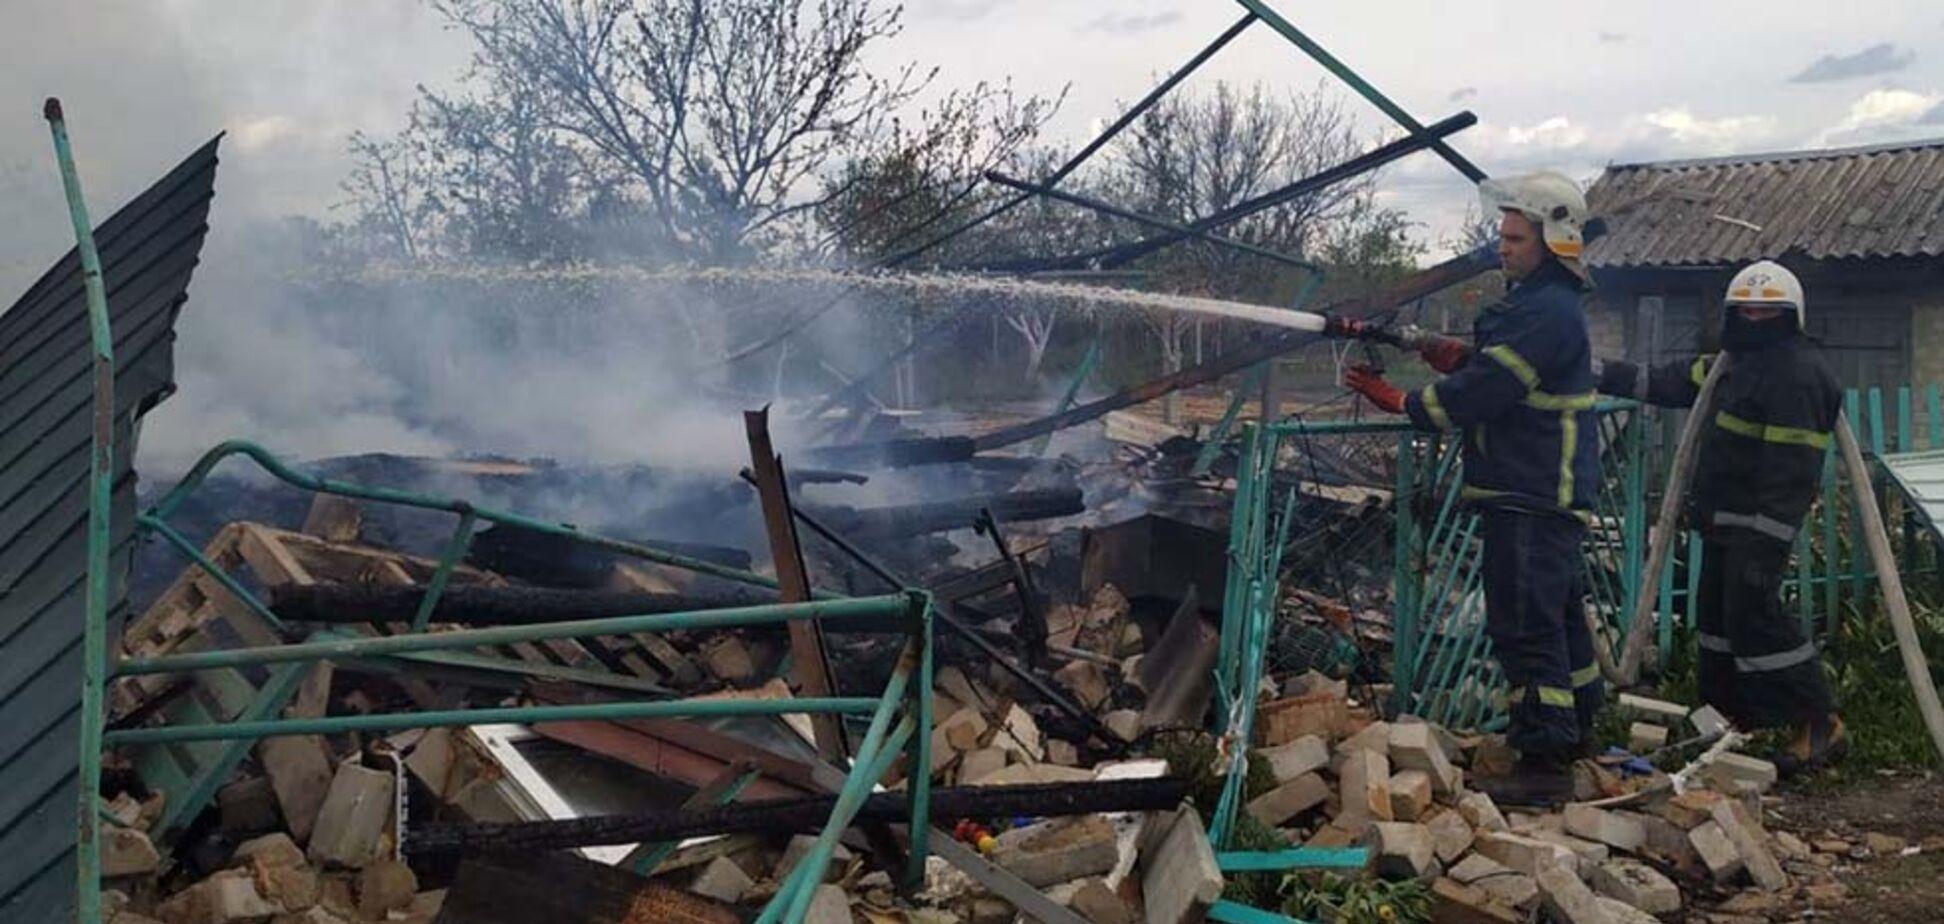 На Днепропетровщине взорвавшийся газовый баллон разрушил дом. Видео